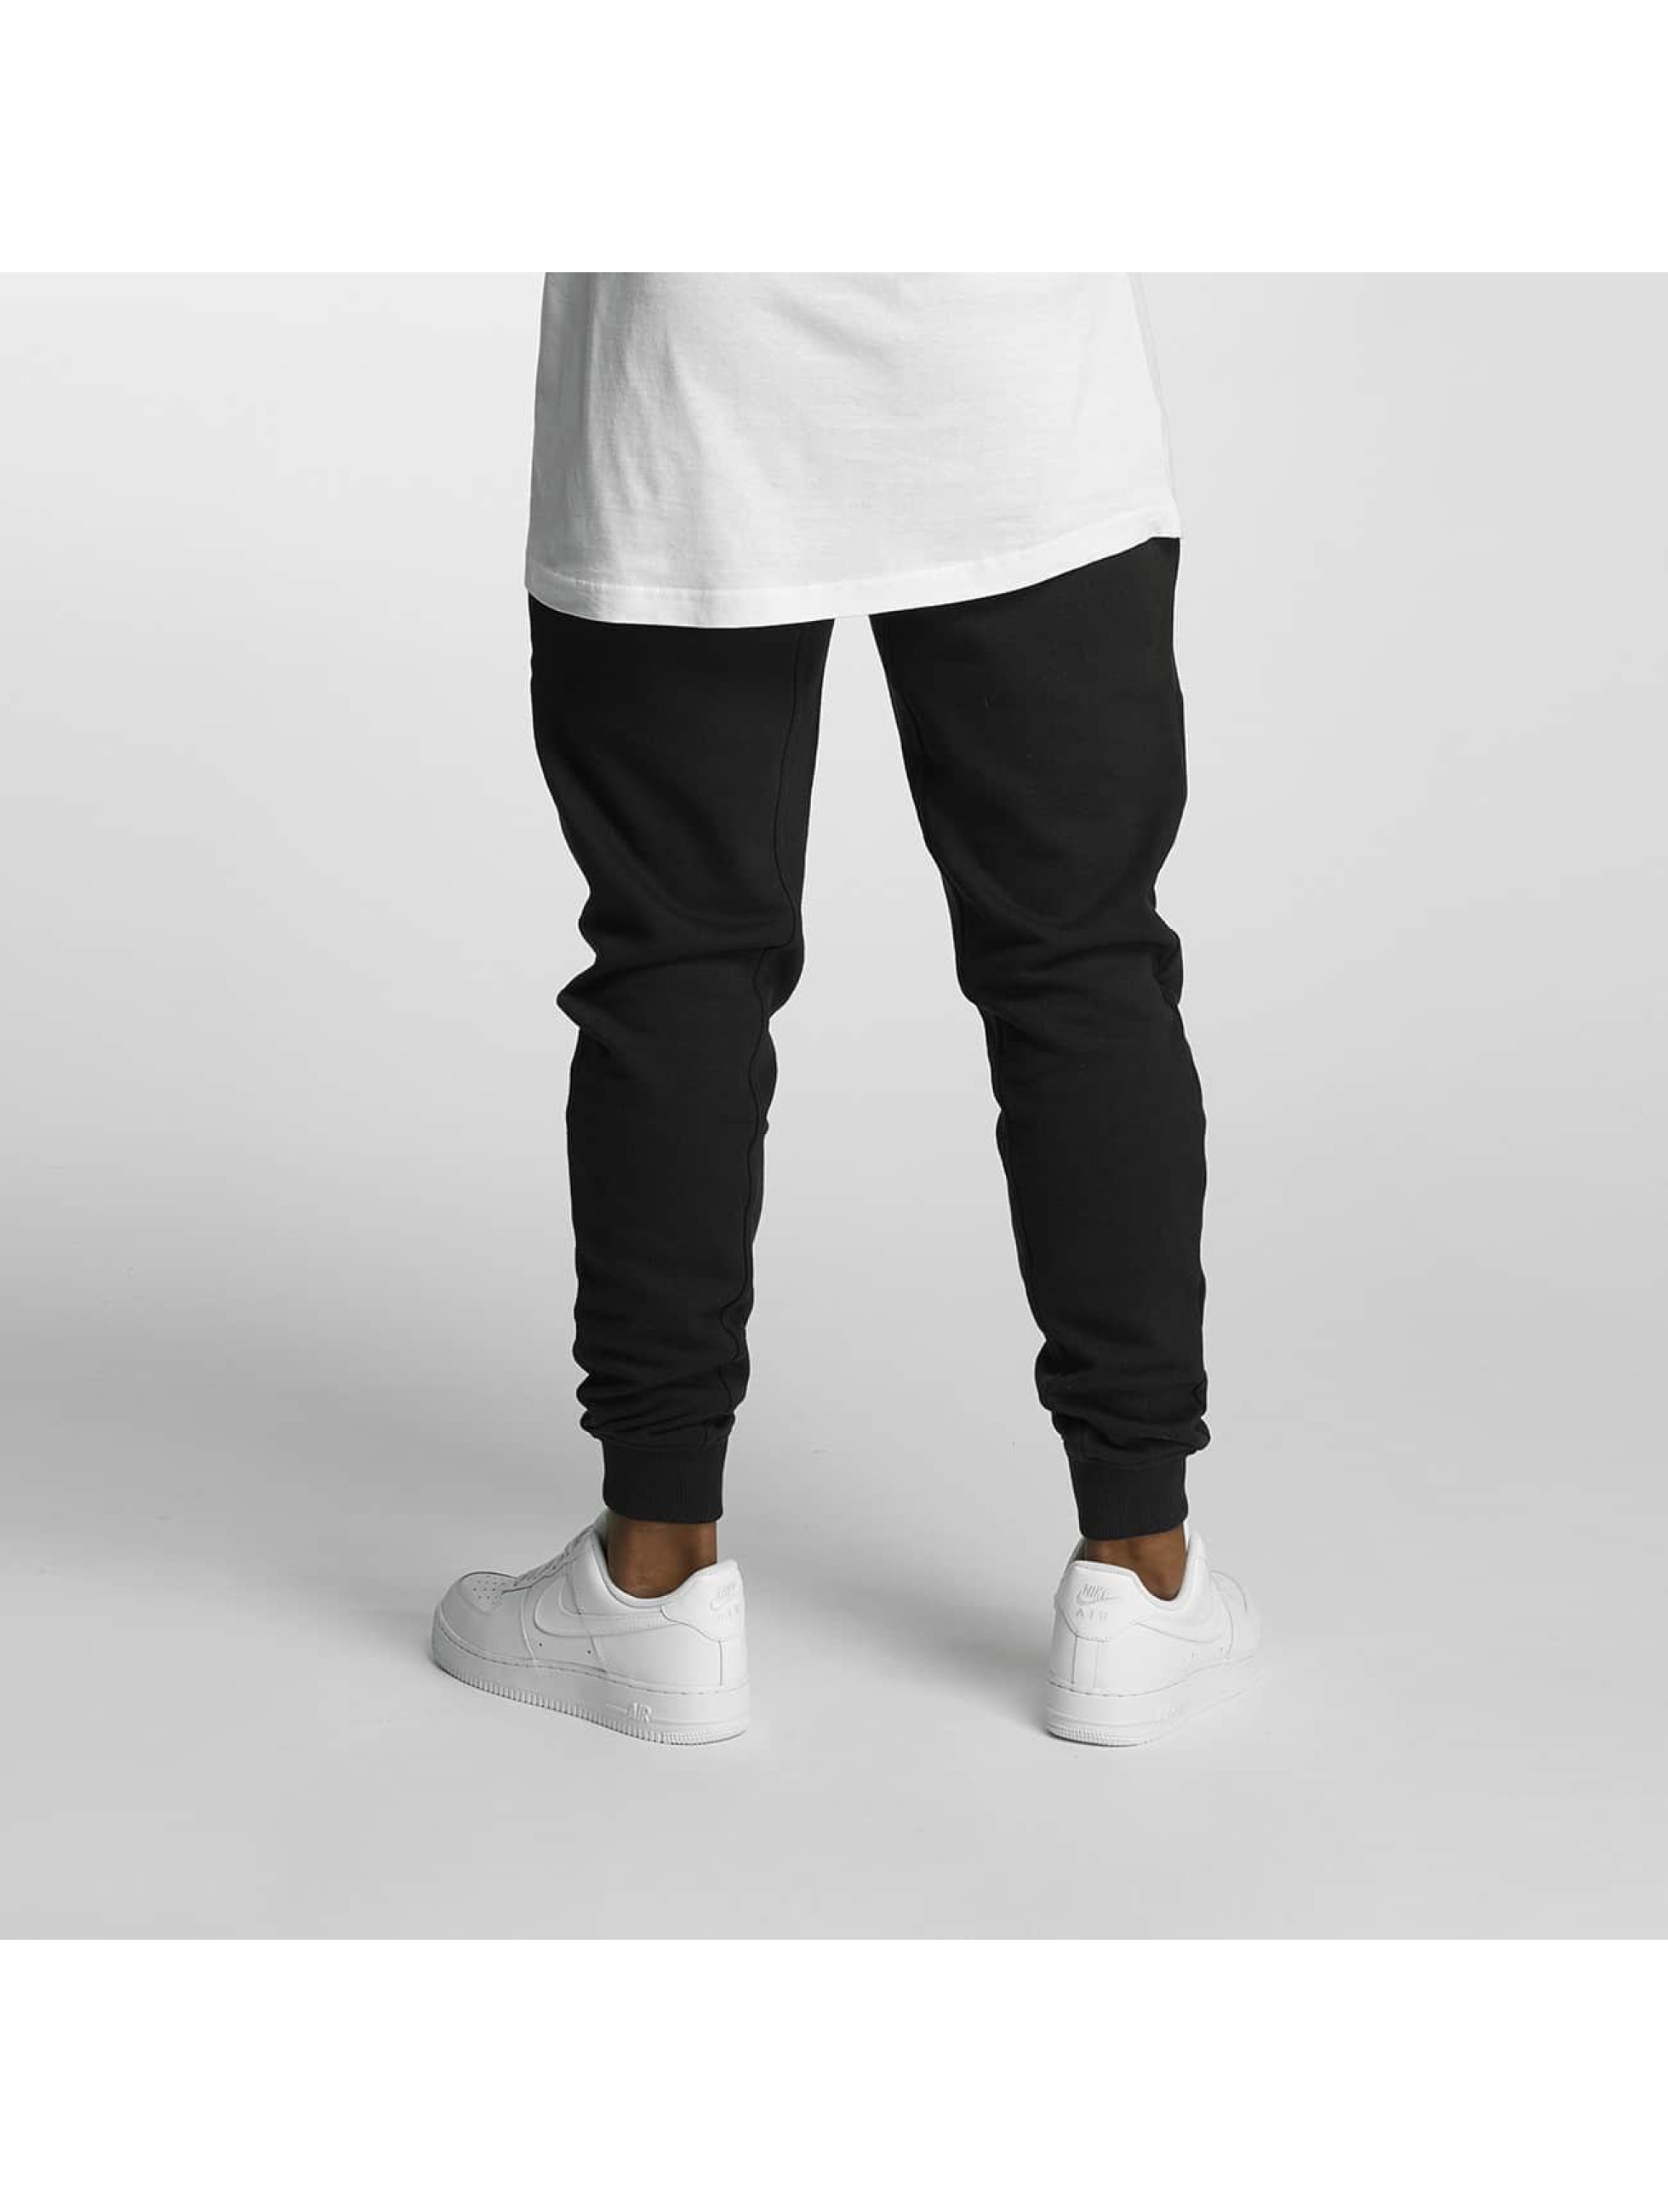 Kingin Pantalone ginnico Osiris nero